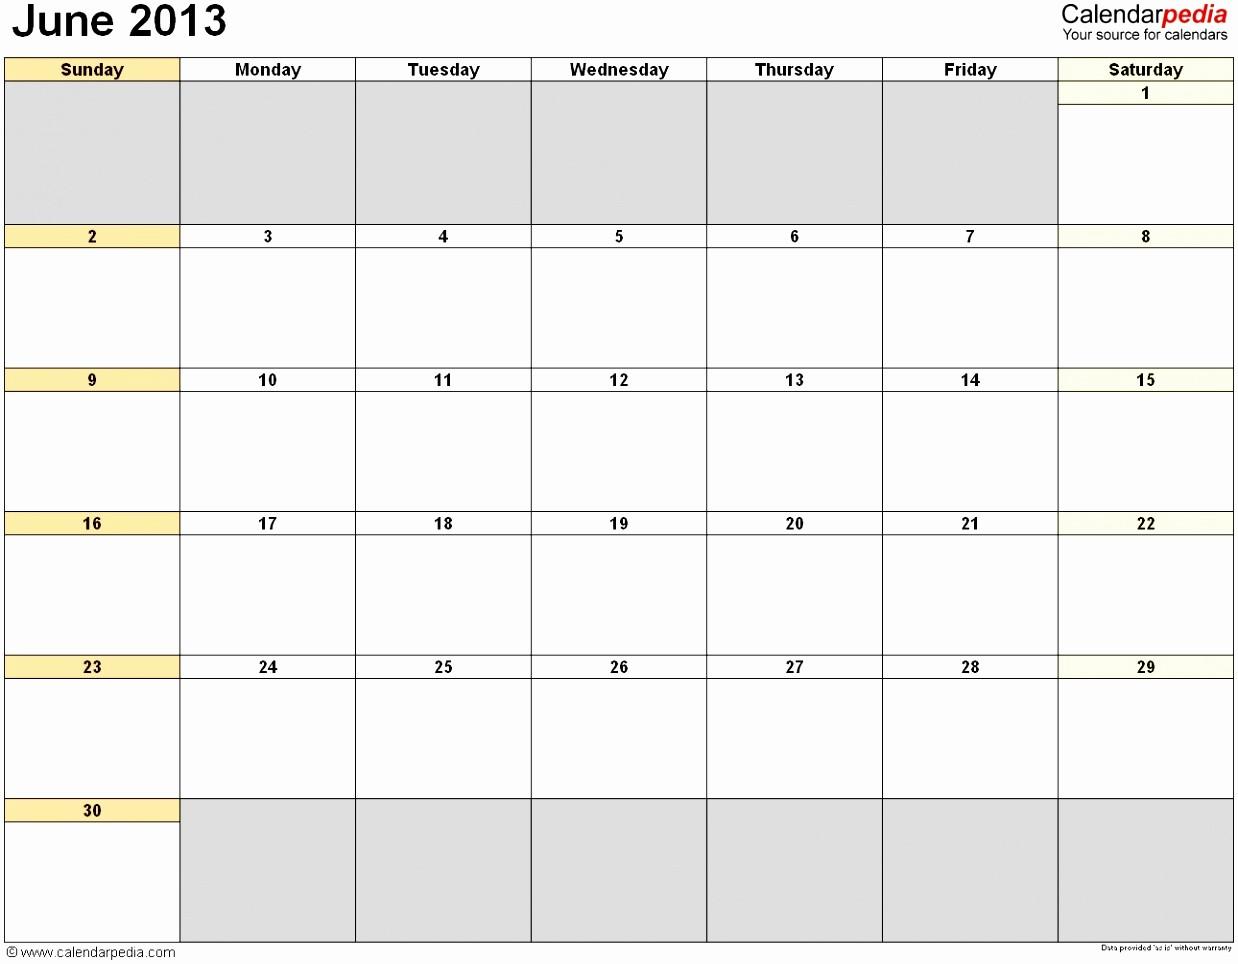 Calendar On Microsoft Word 2010 Luxury 5 2015 Calendar Template Word 2010 Tubif